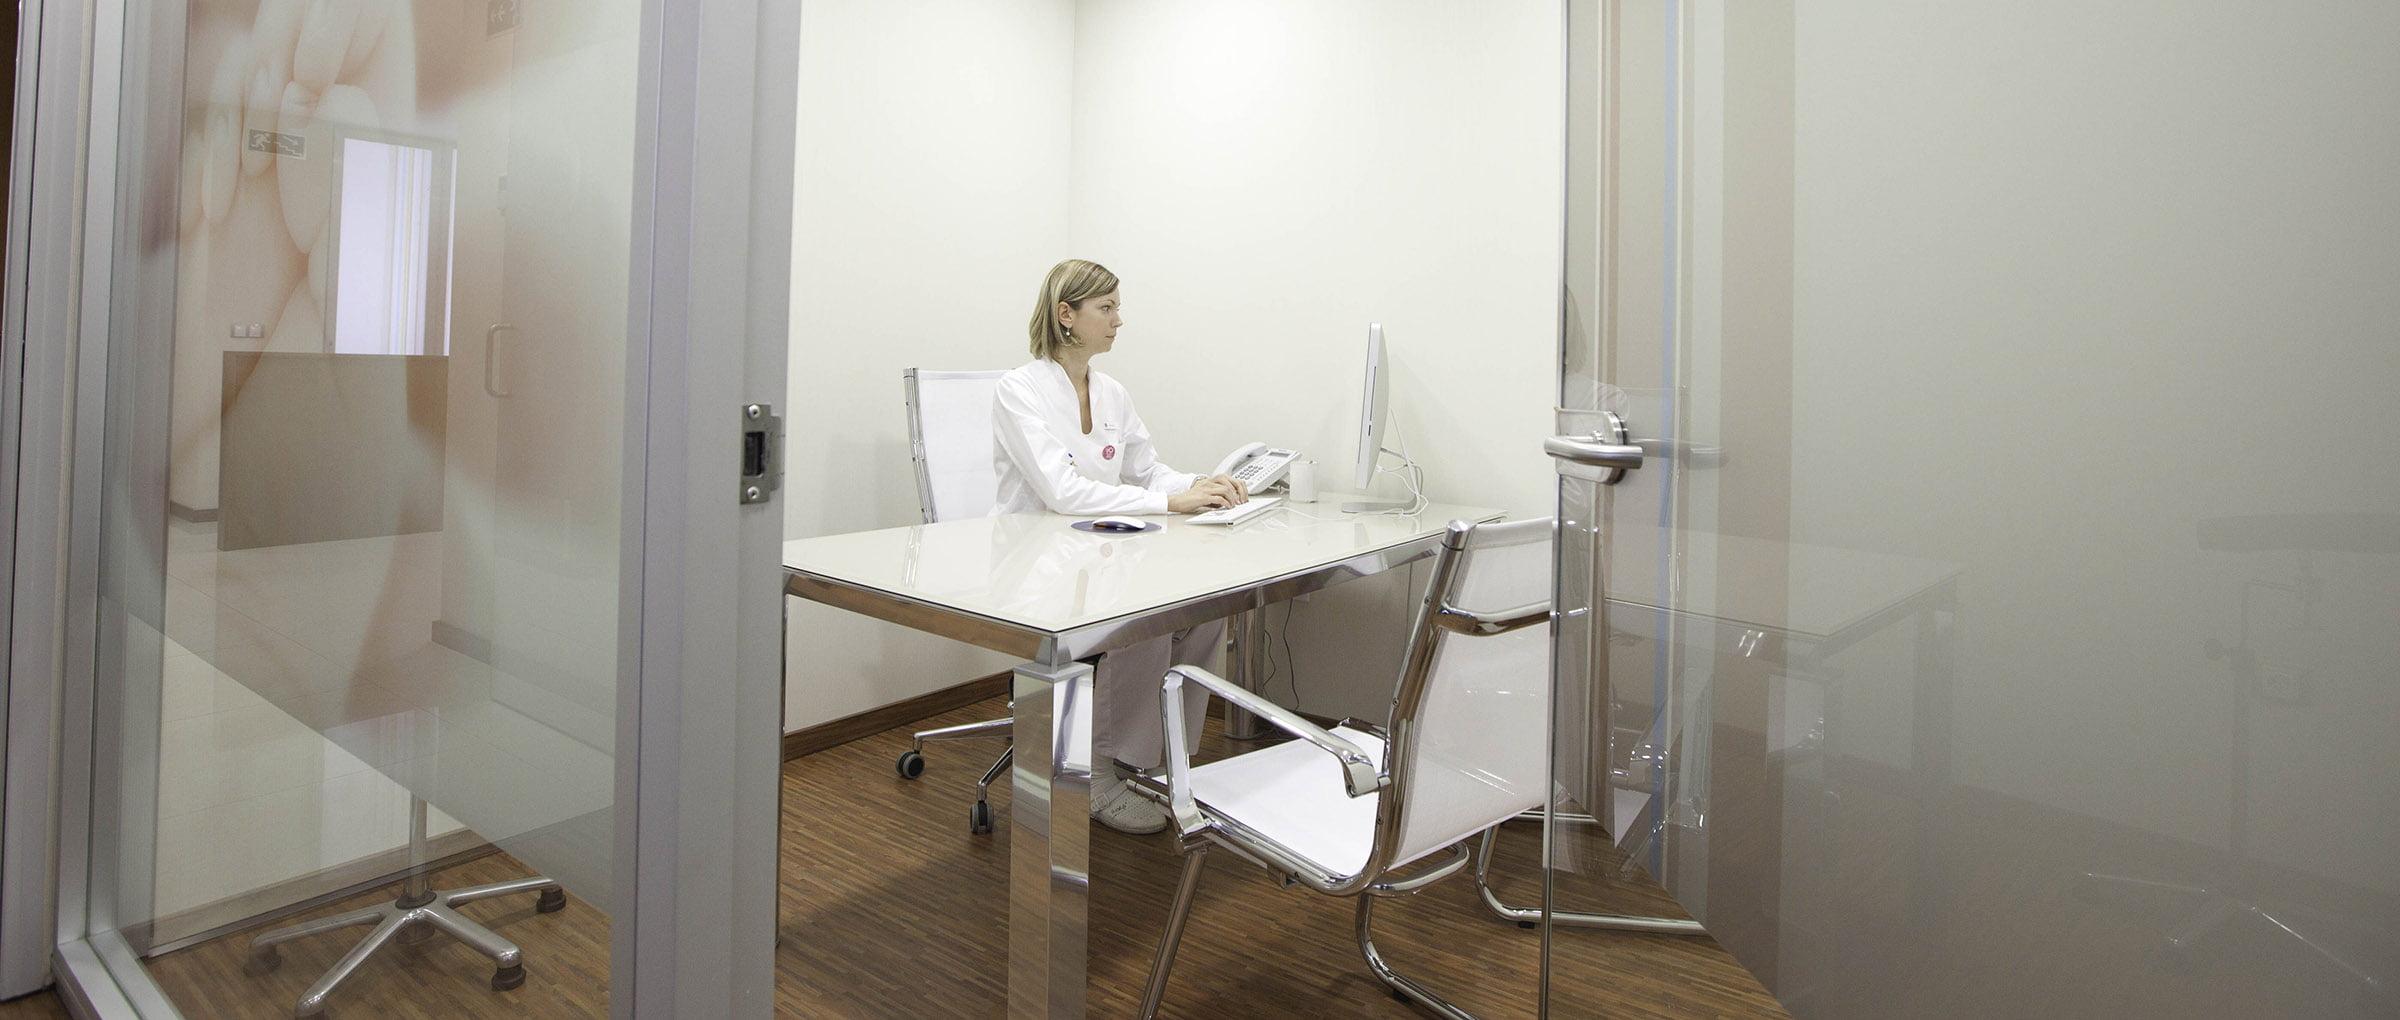 Crea consulta médica